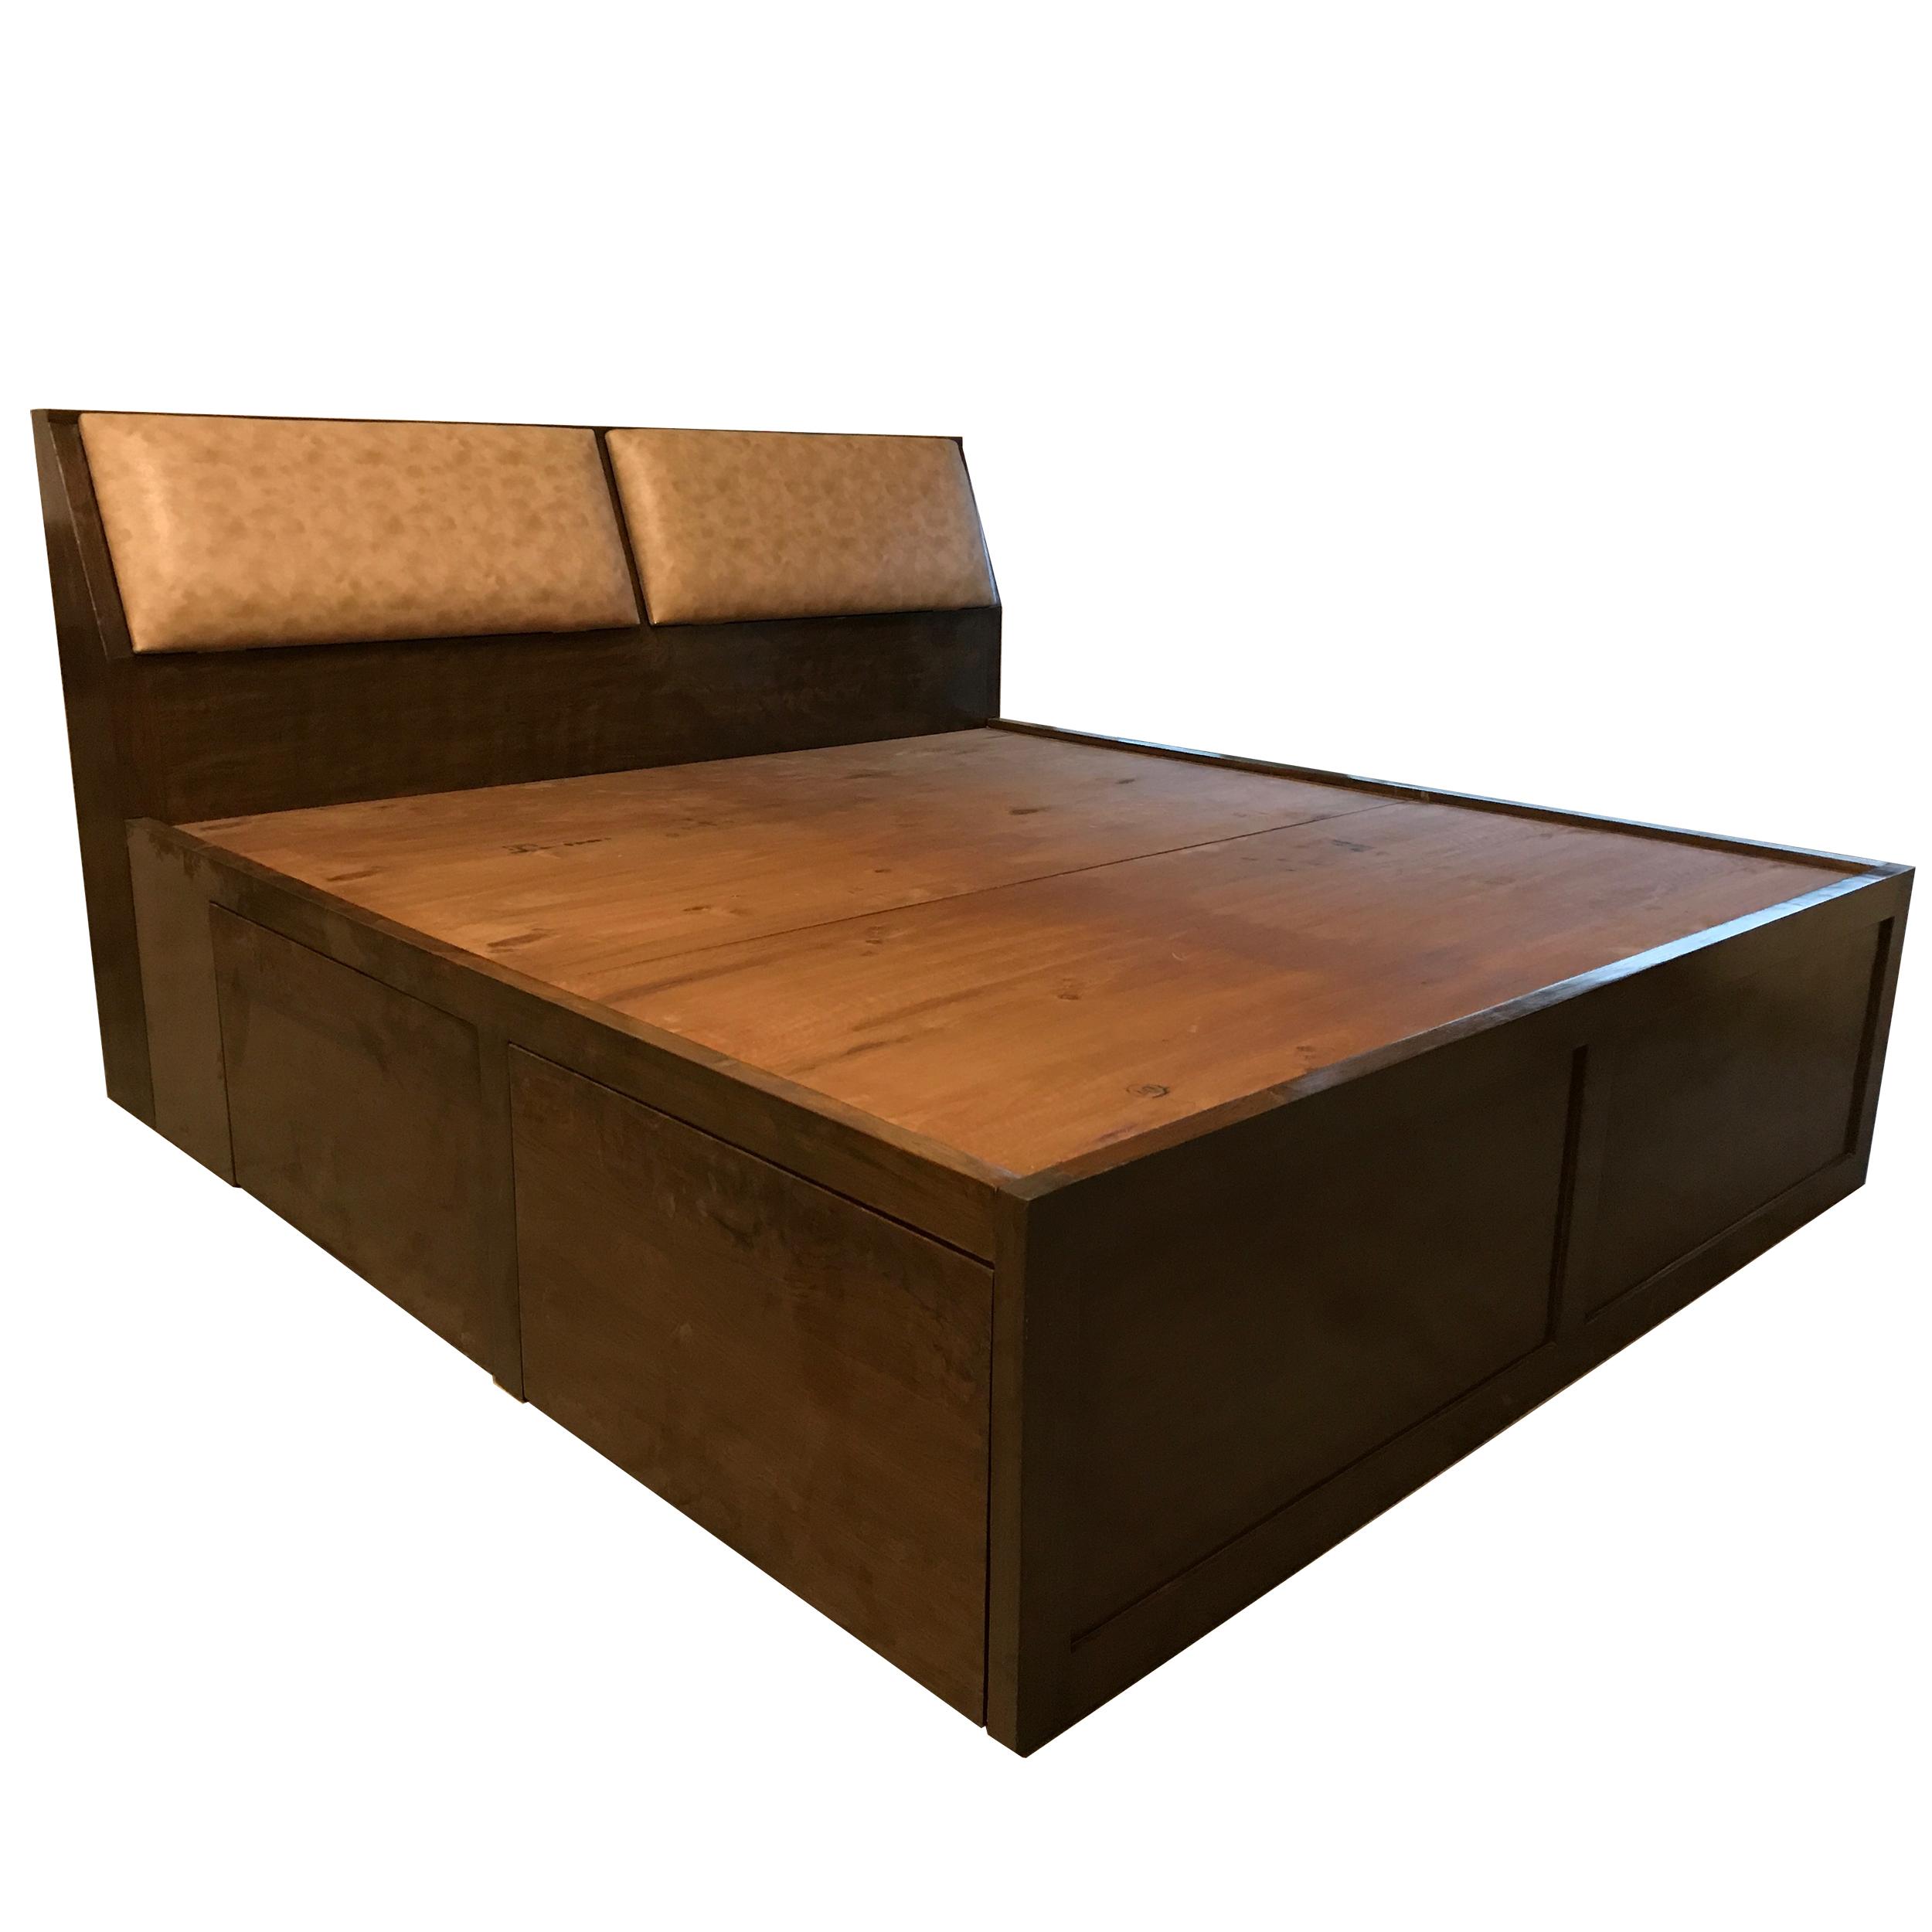 Charmant Home / Bedroom Furniture ...